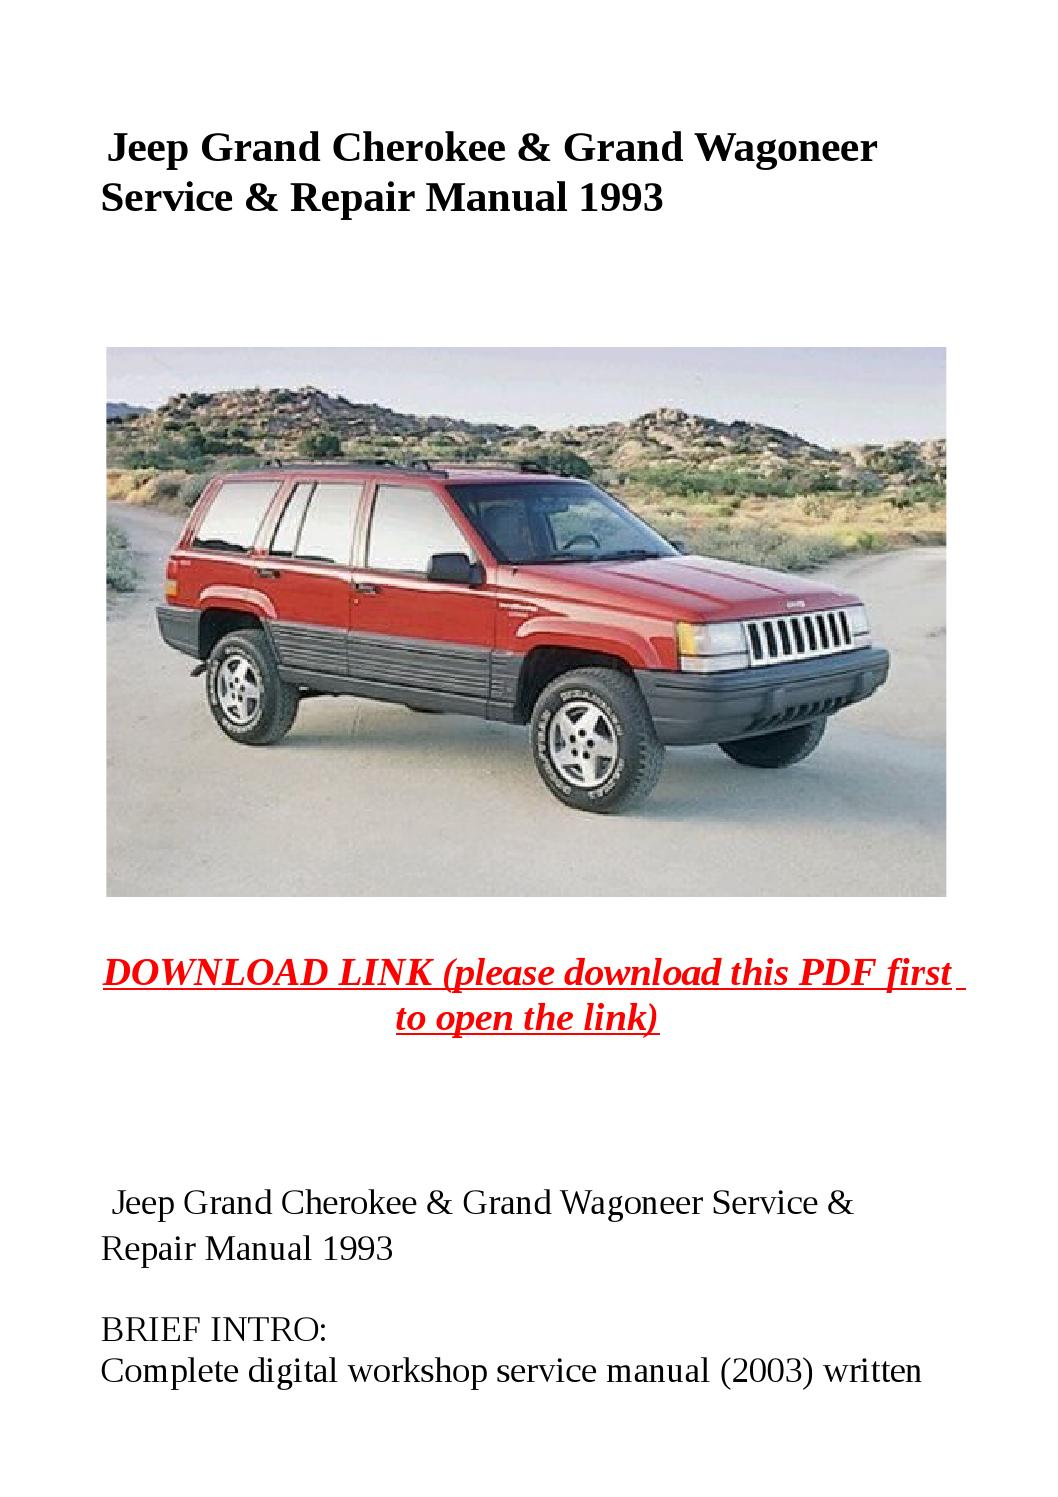 Jeep Grand Cherokee 1993 Manual Guide